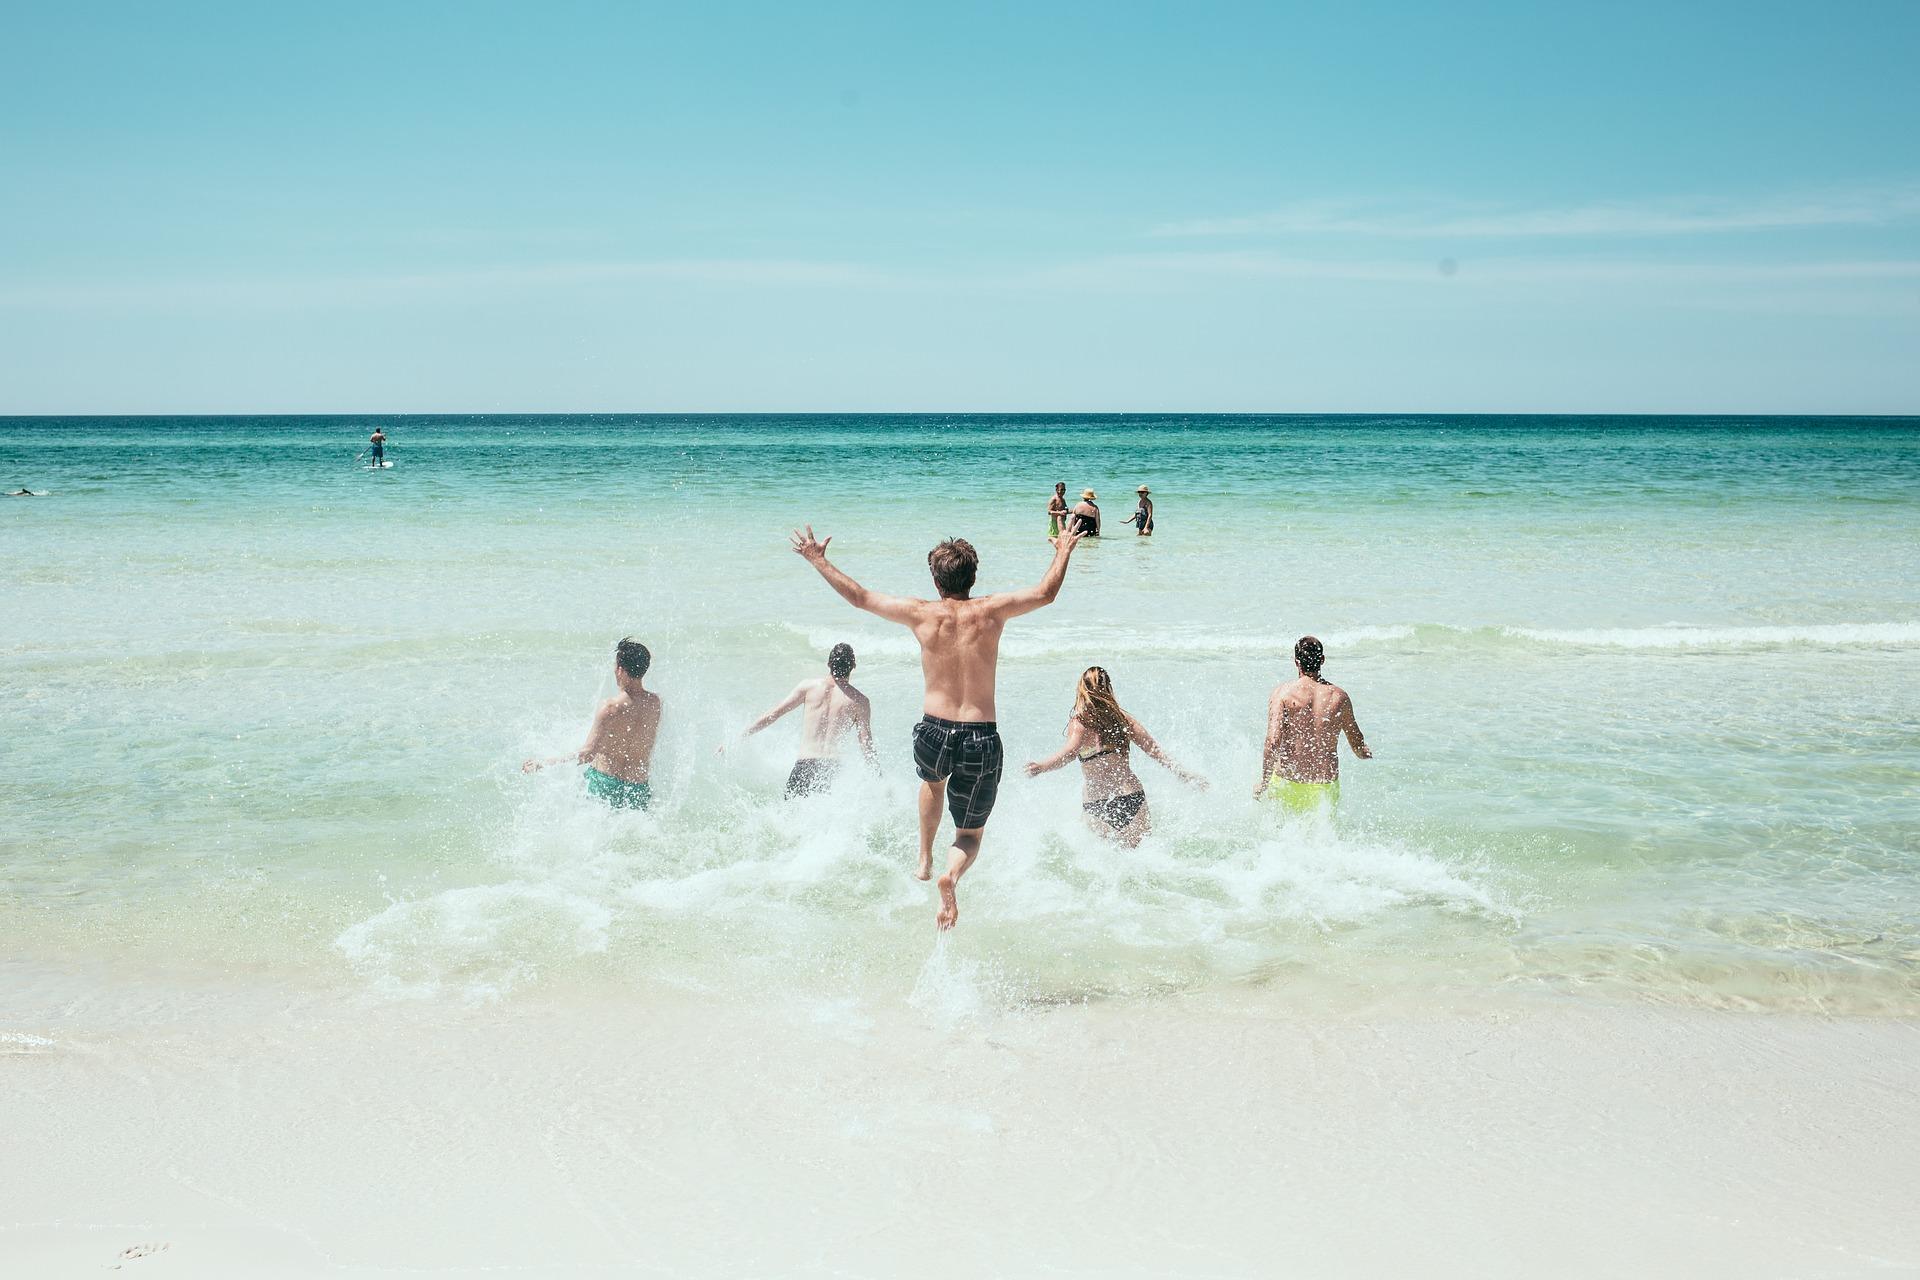 vakantiegroepskorting slider korting vakanties